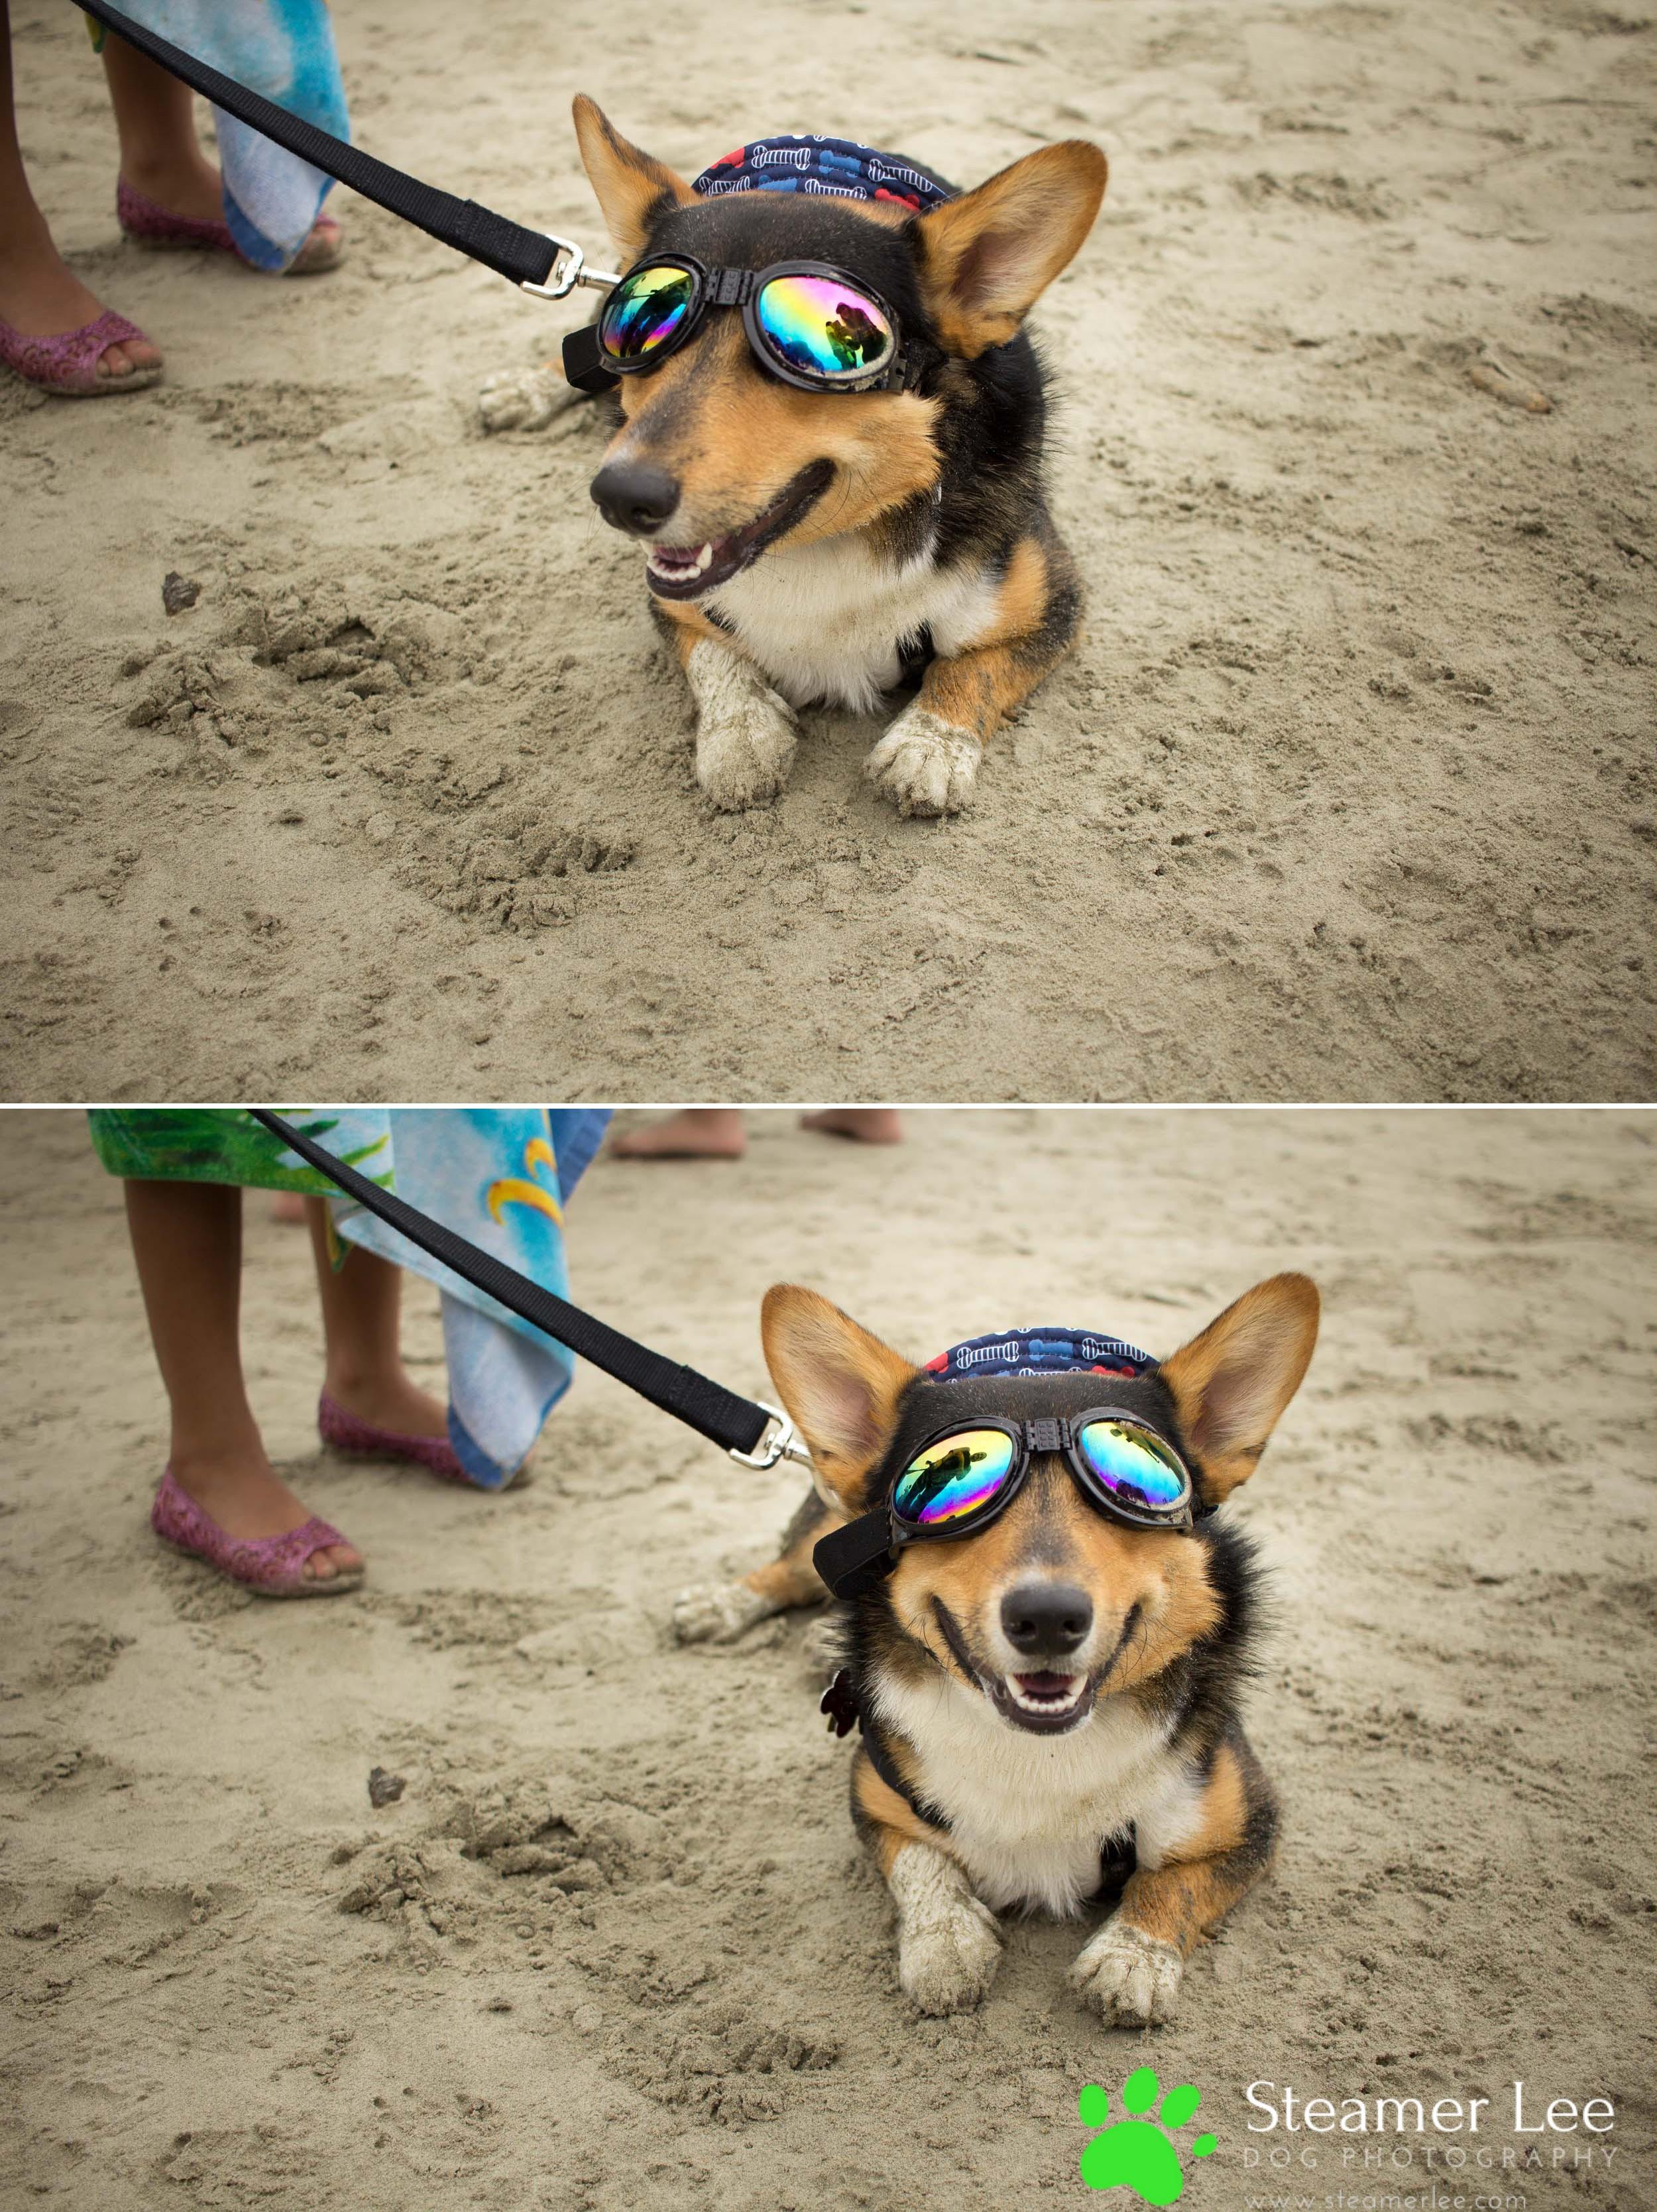 Steamer Lee Dog Photography - July 2017 So Cal Corgi Beach Day - Vol. 3 - 46.jpg